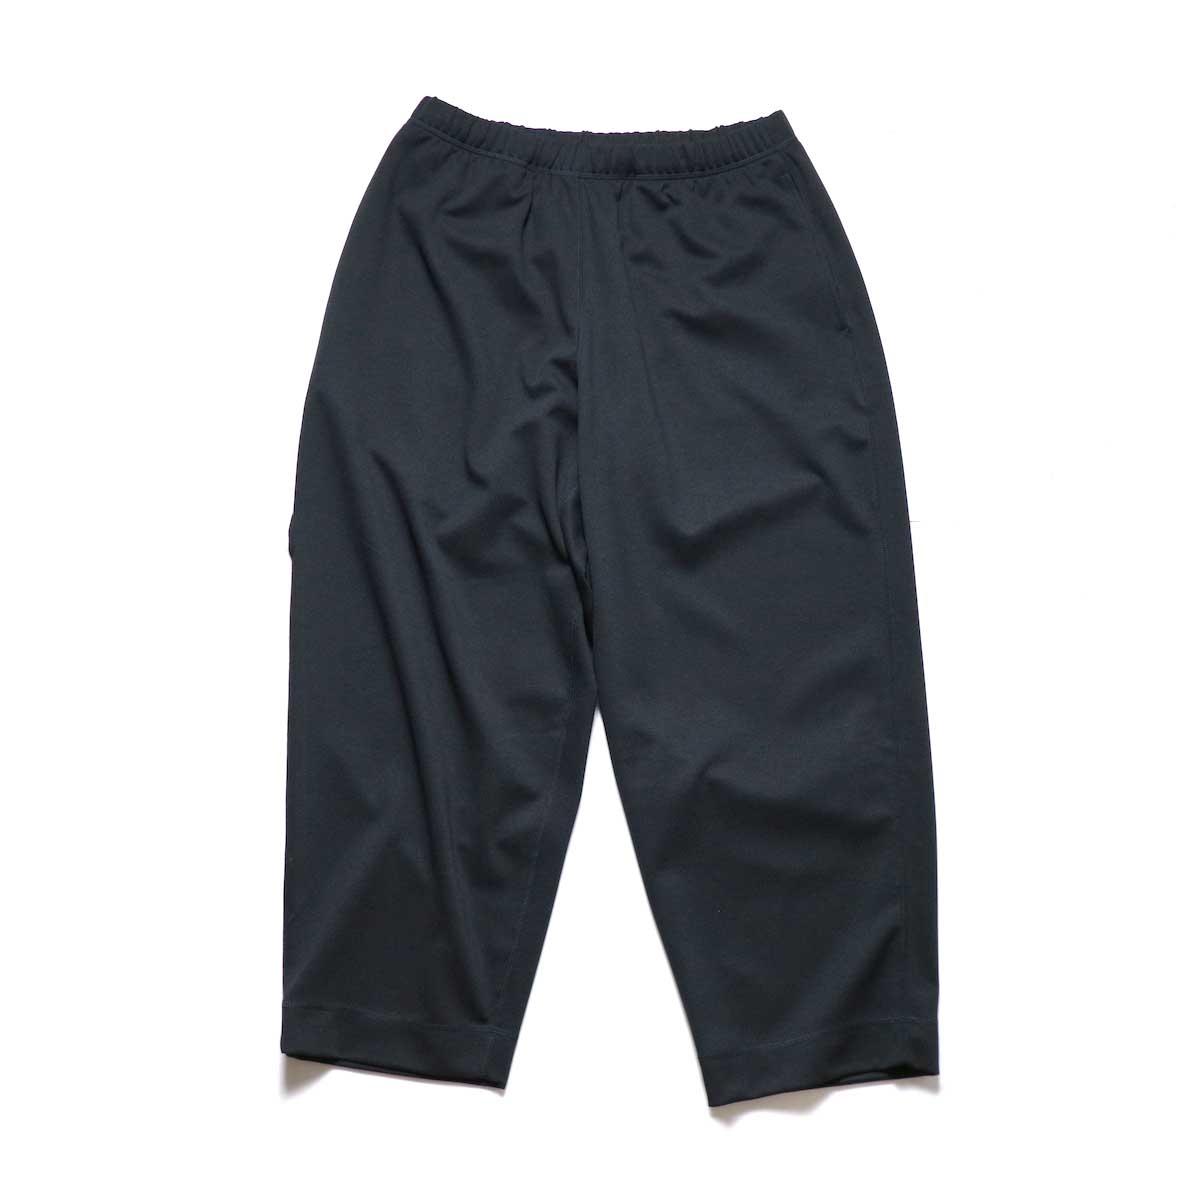 N.HOOLYWOOD / 24RCH-090 Easy Pants (Black)